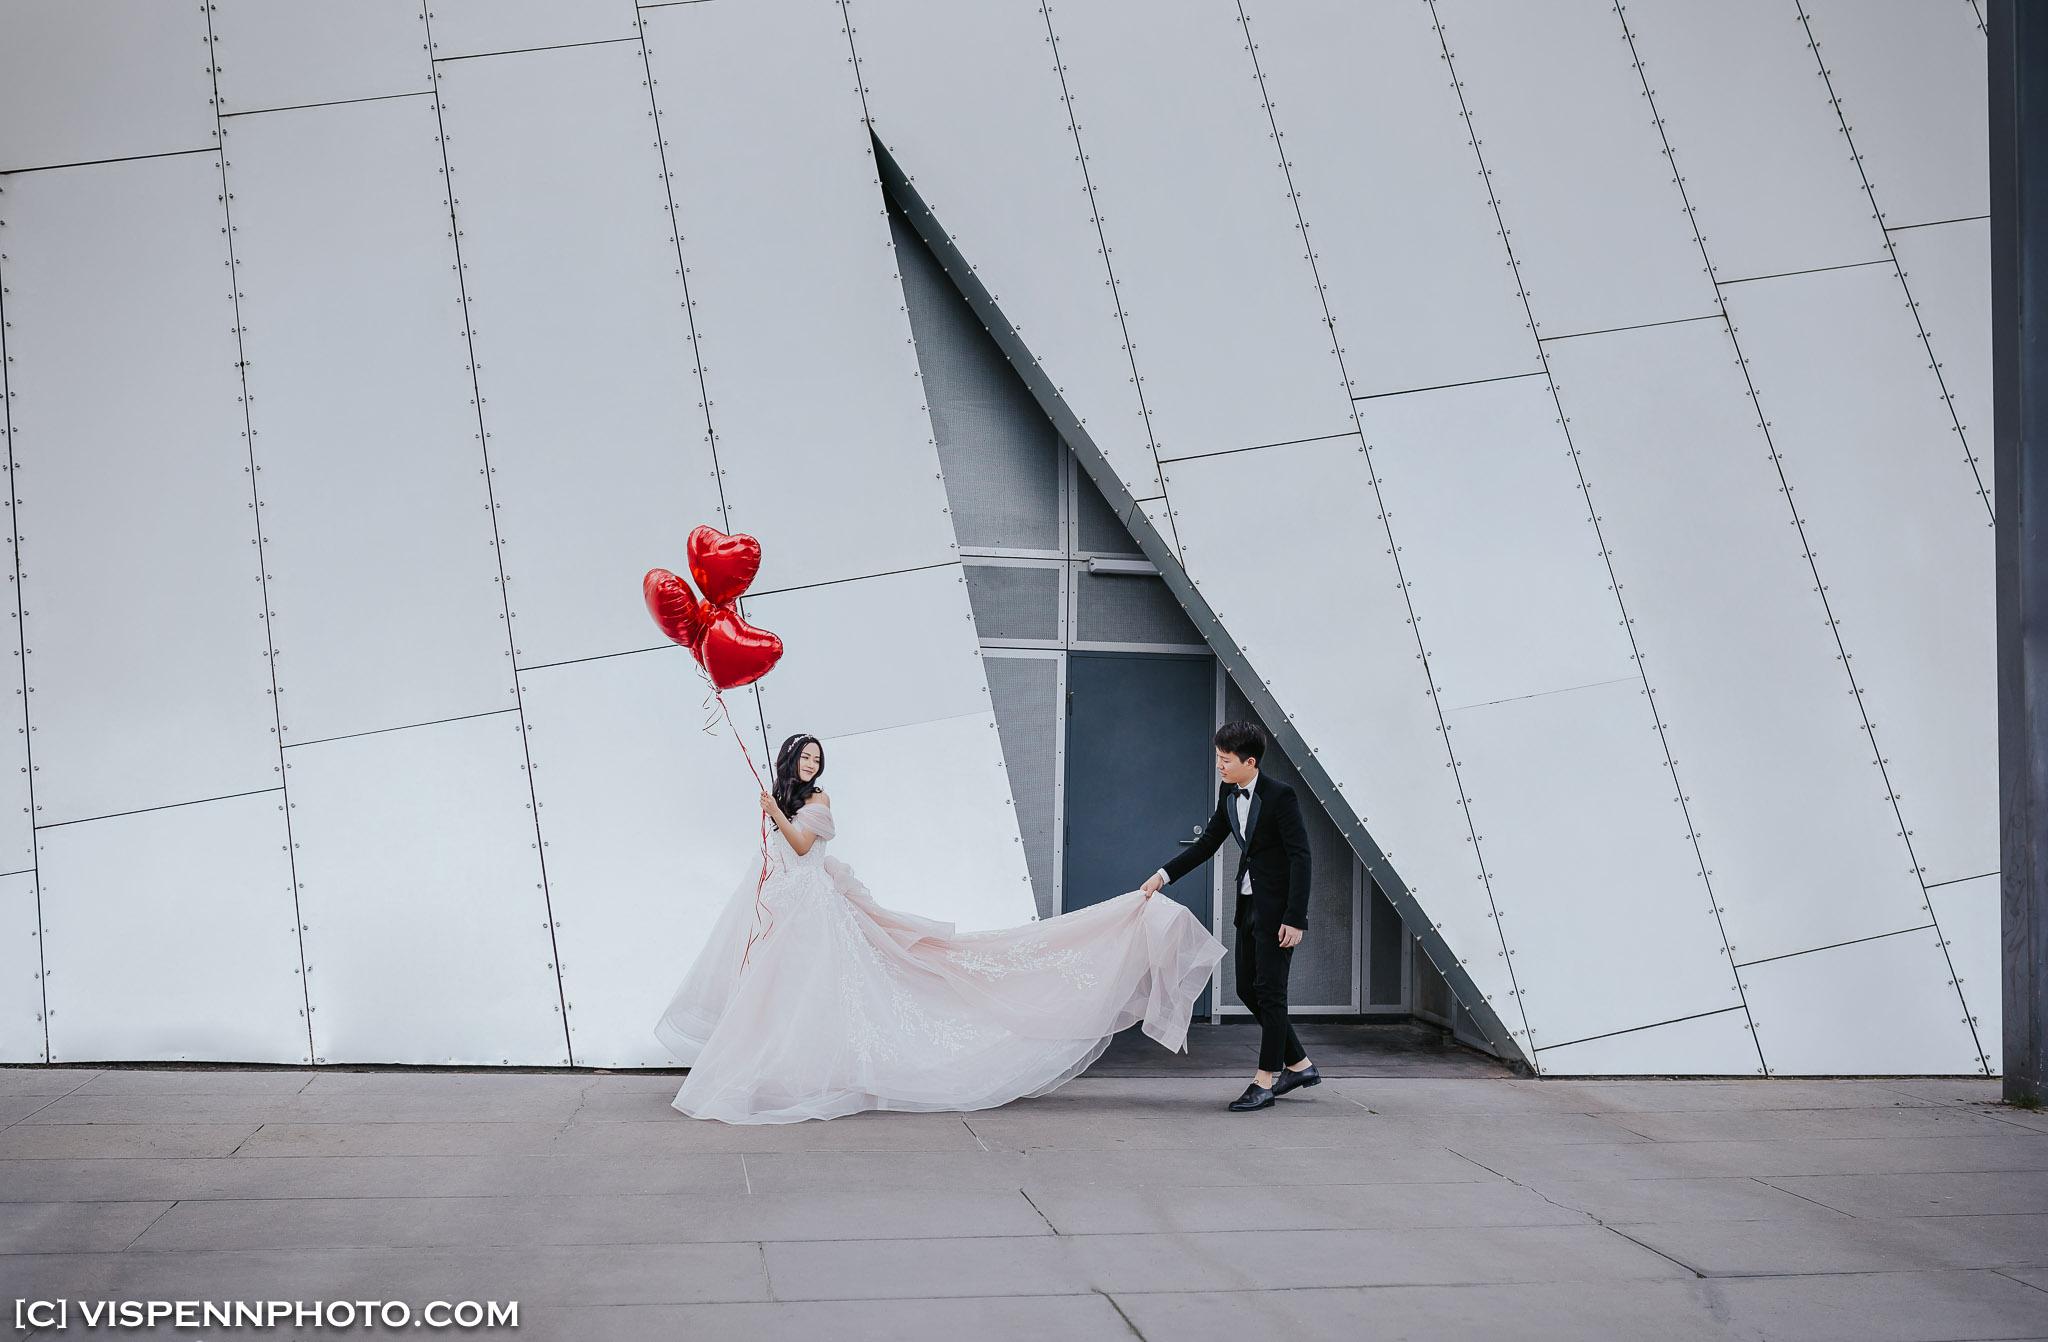 PRE WEDDING Photography Melbourne VISPENN 墨尔本 婚纱照 结婚照 婚纱摄影 VISPENN P5D4 1364